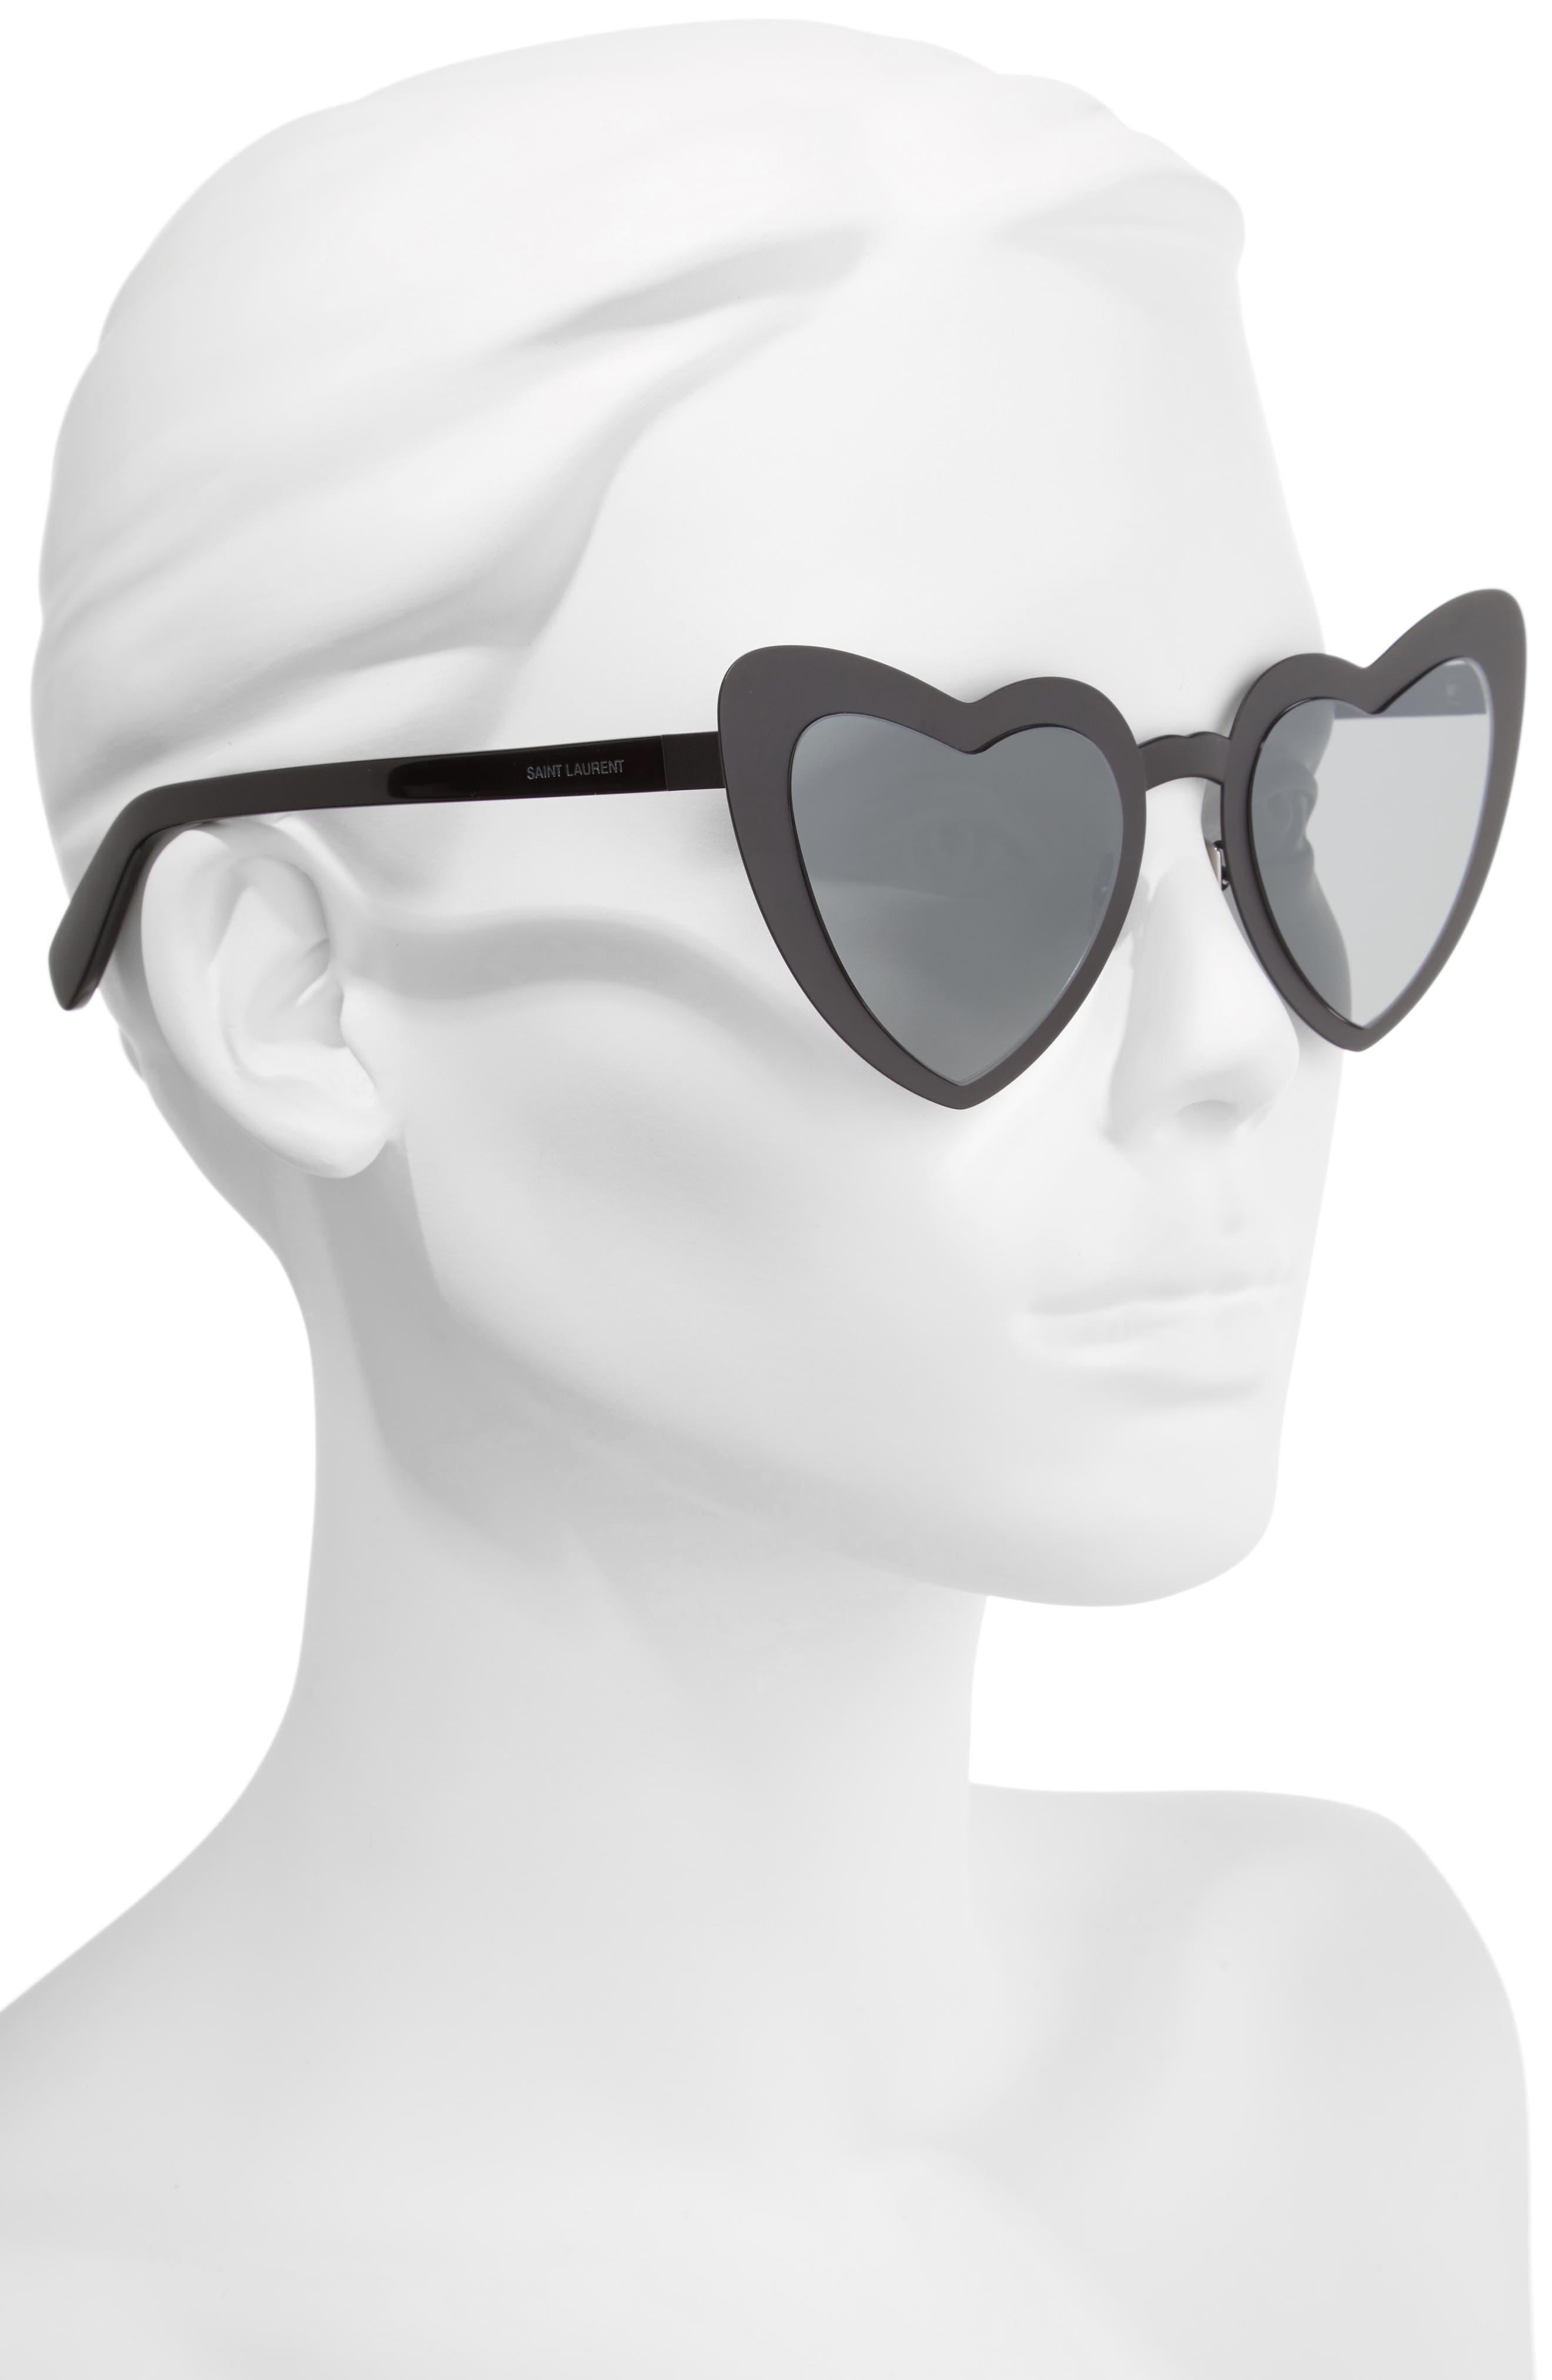 Loulou 55mm Heart Shaped Sunglasses,                             Alternate thumbnail 2, color,                             BLACK